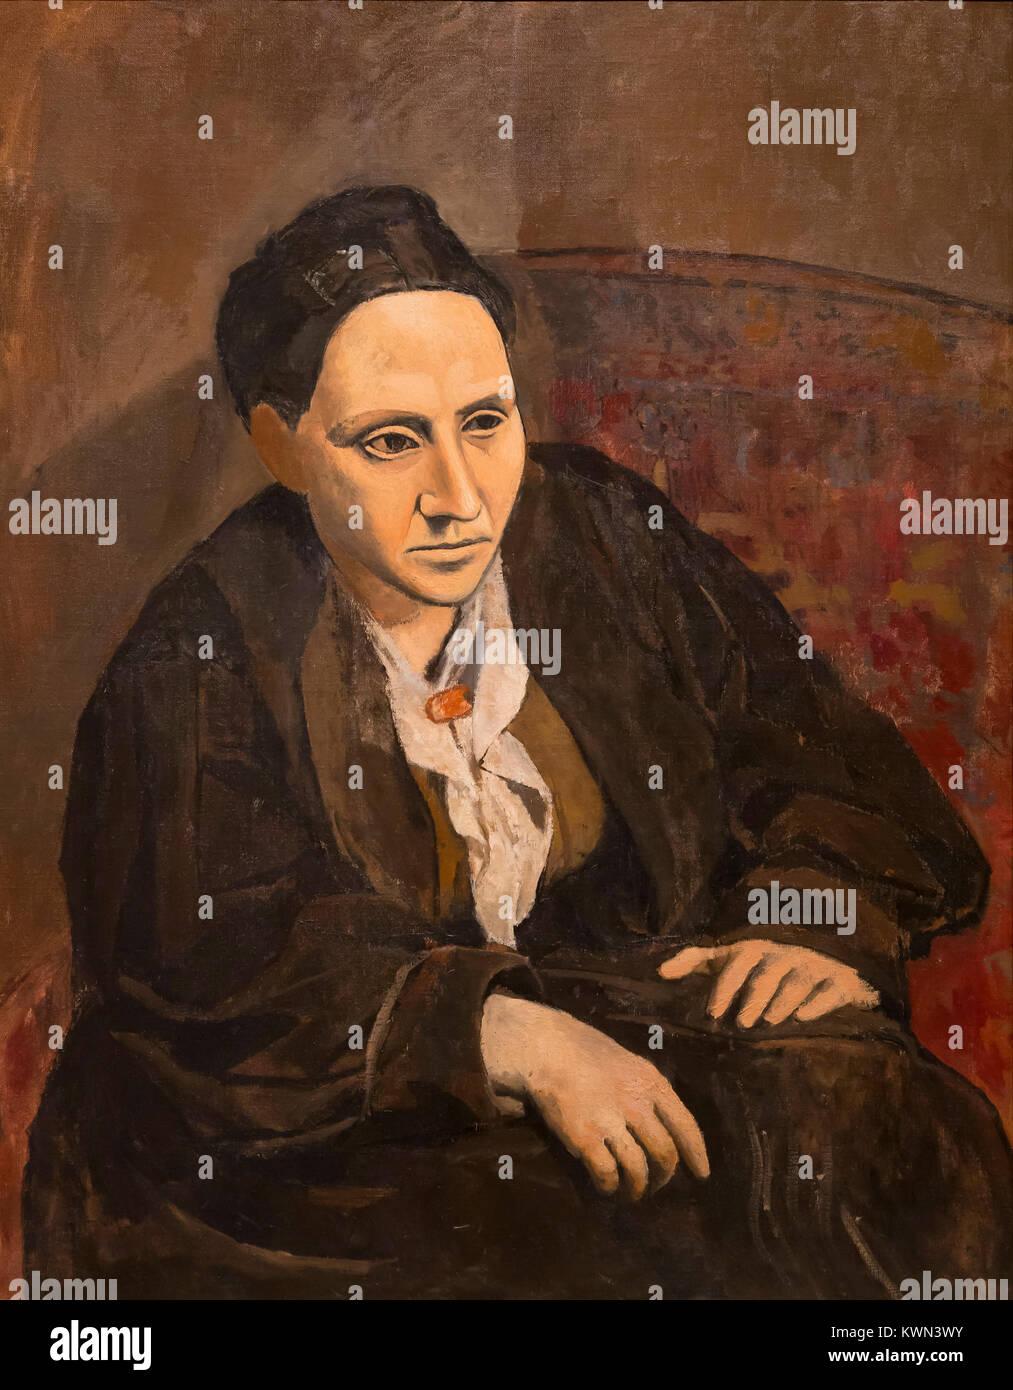 Gertrude Stein, Pablo Picasso, 1905-1906, - Stock Image